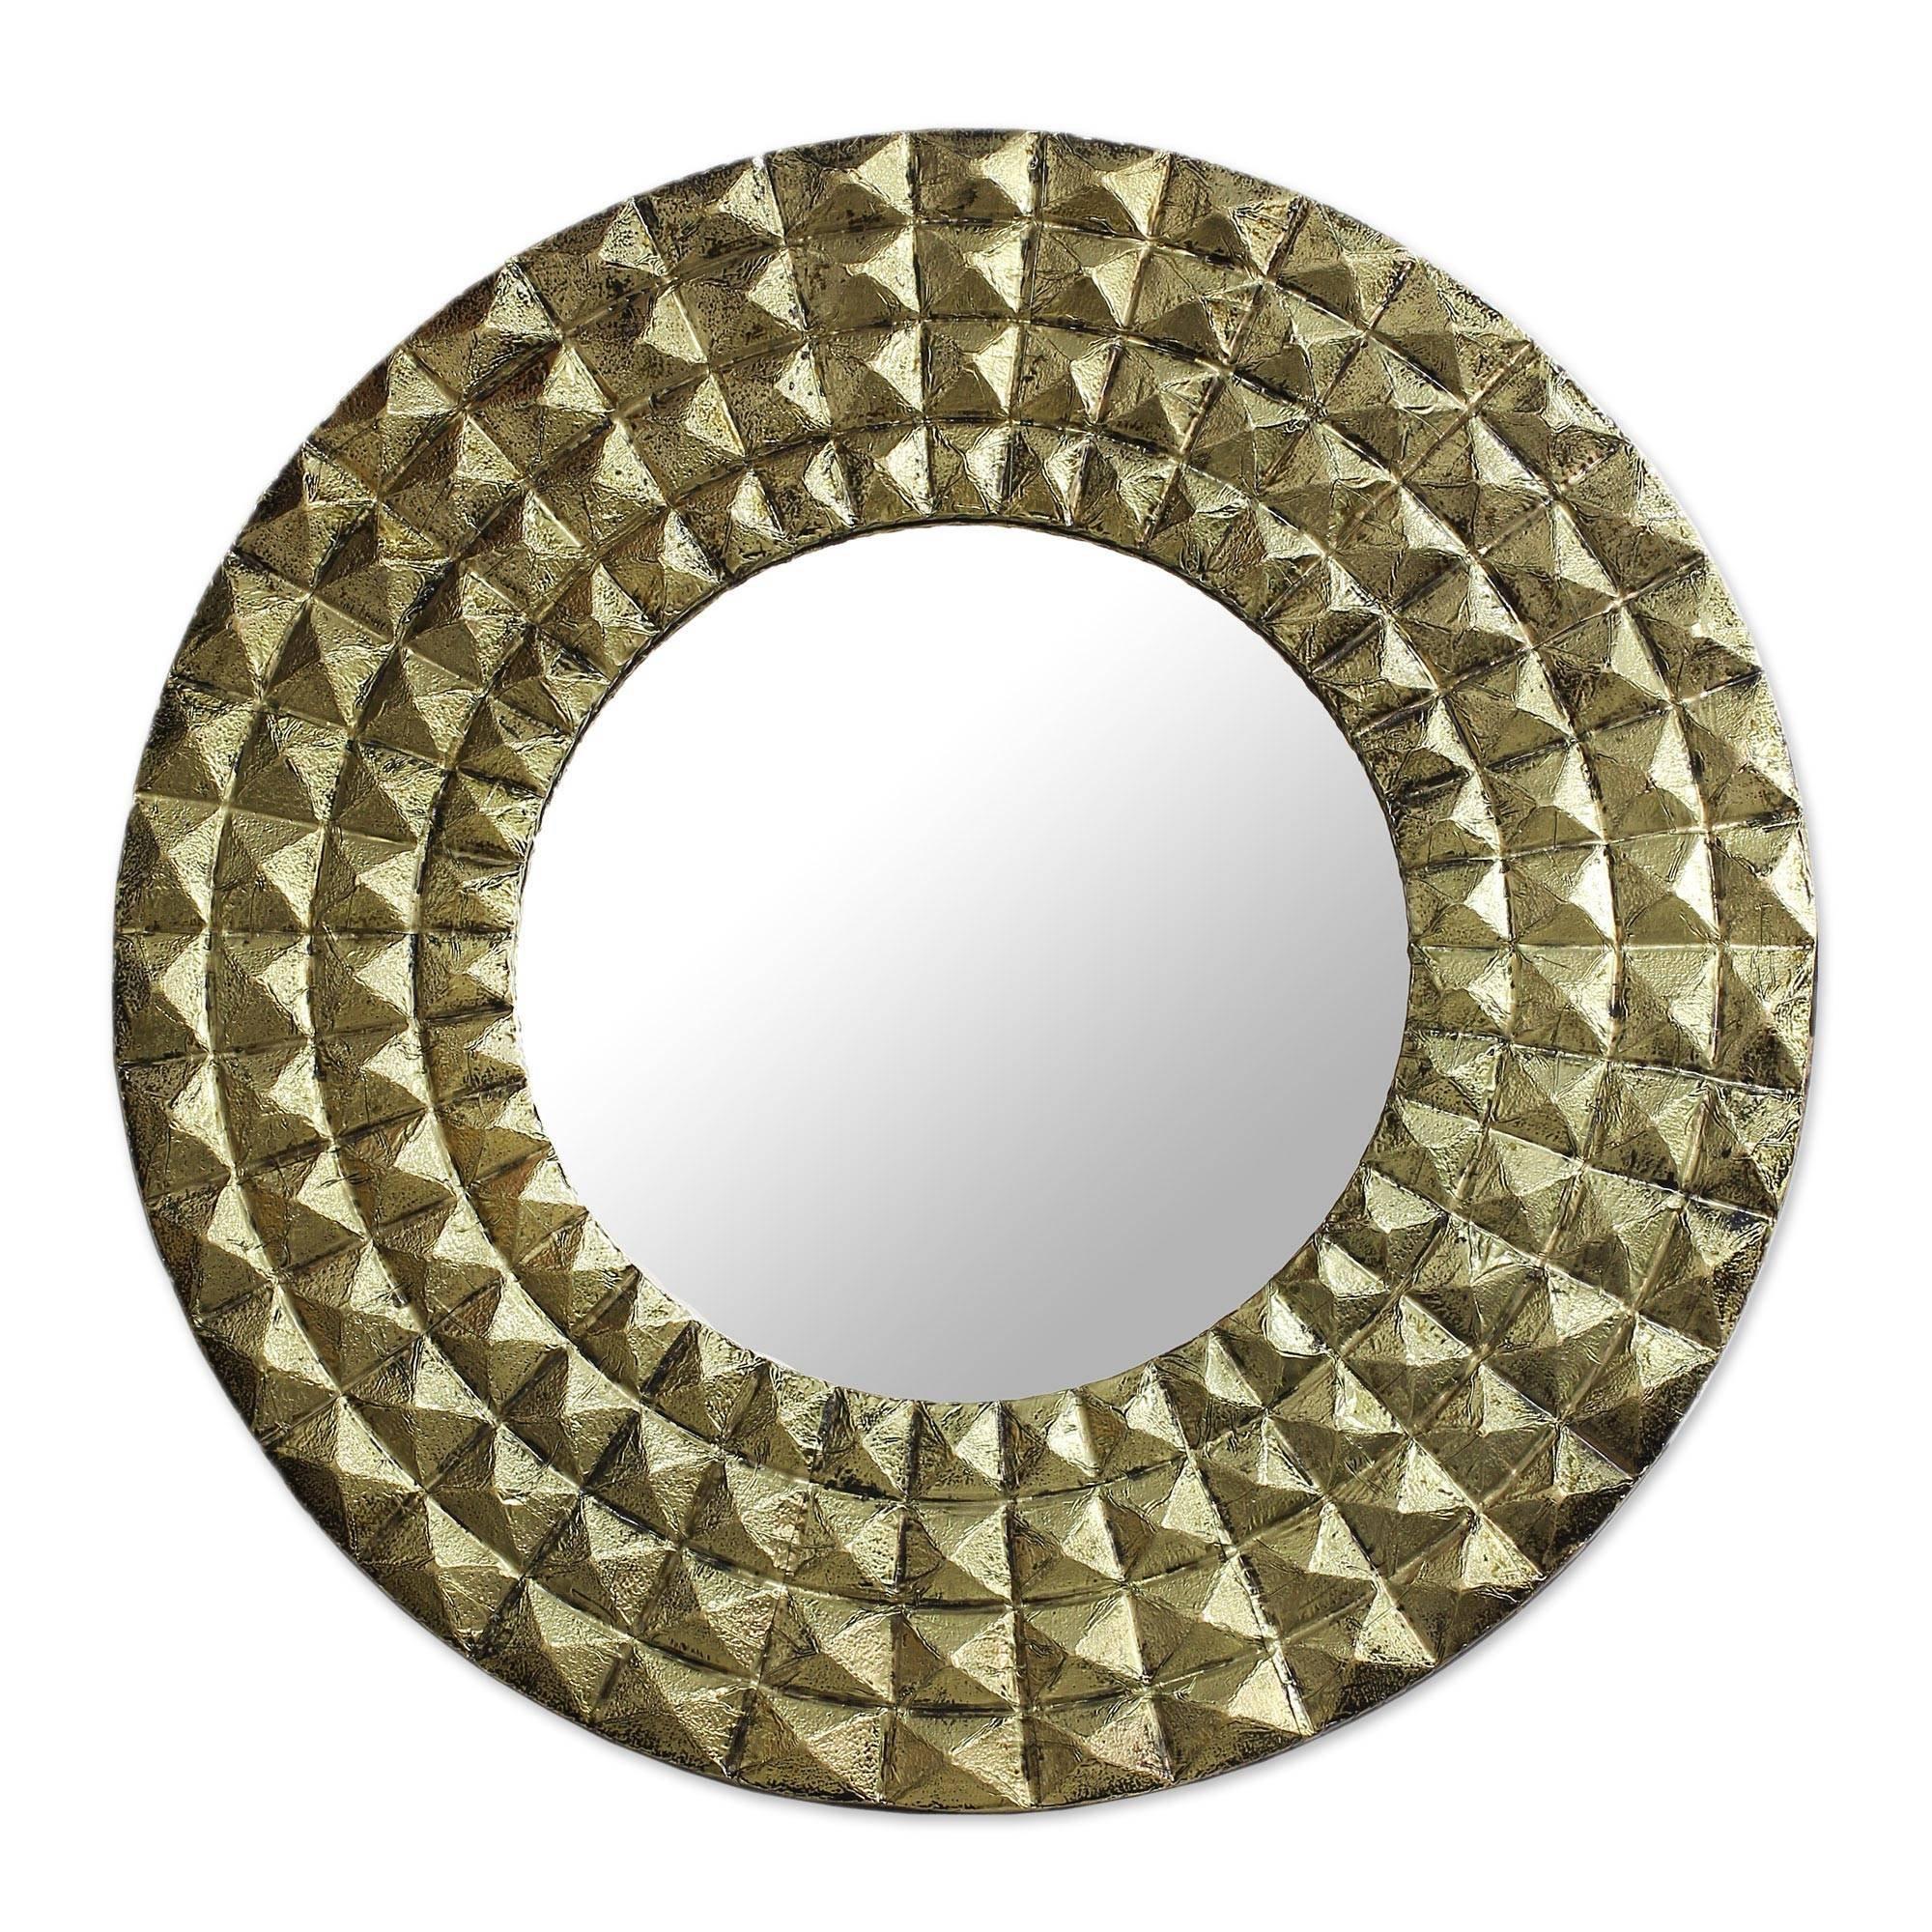 NOVICA Decorative Glass Wall Mounted Mirror, Gold Tone Brass 'Circling Pyramids'